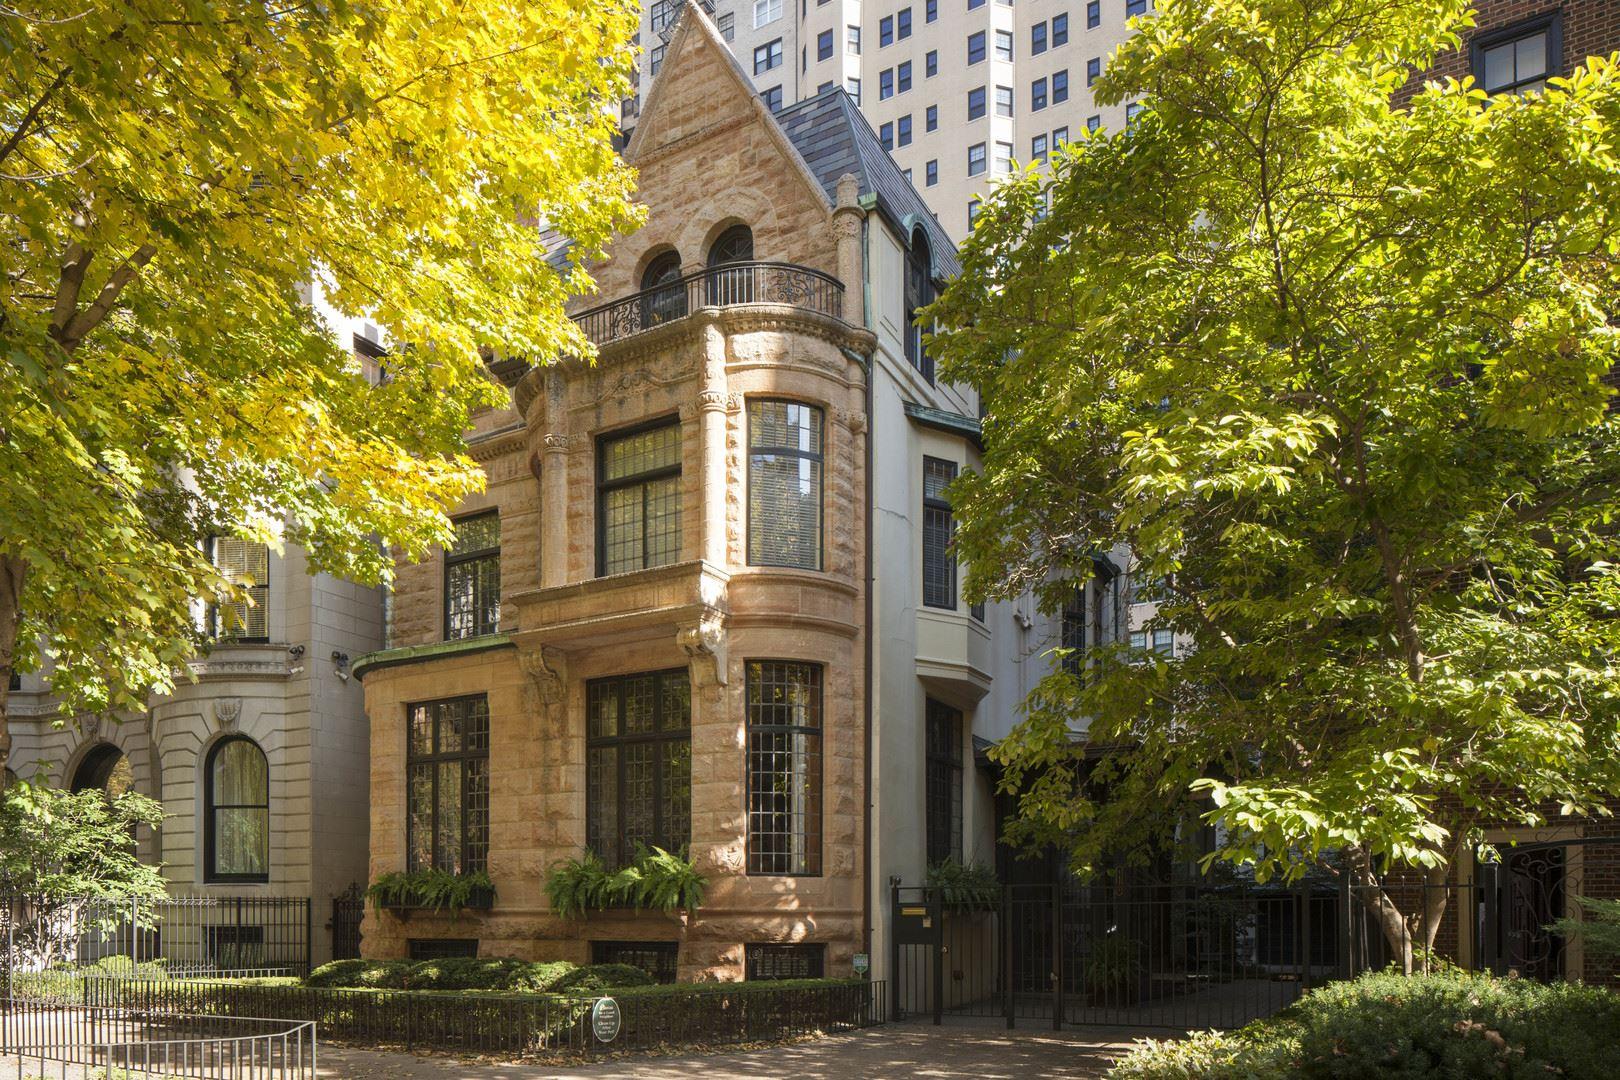 1421 N Astor Street, Chicago, IL 60610 - #: 09837078